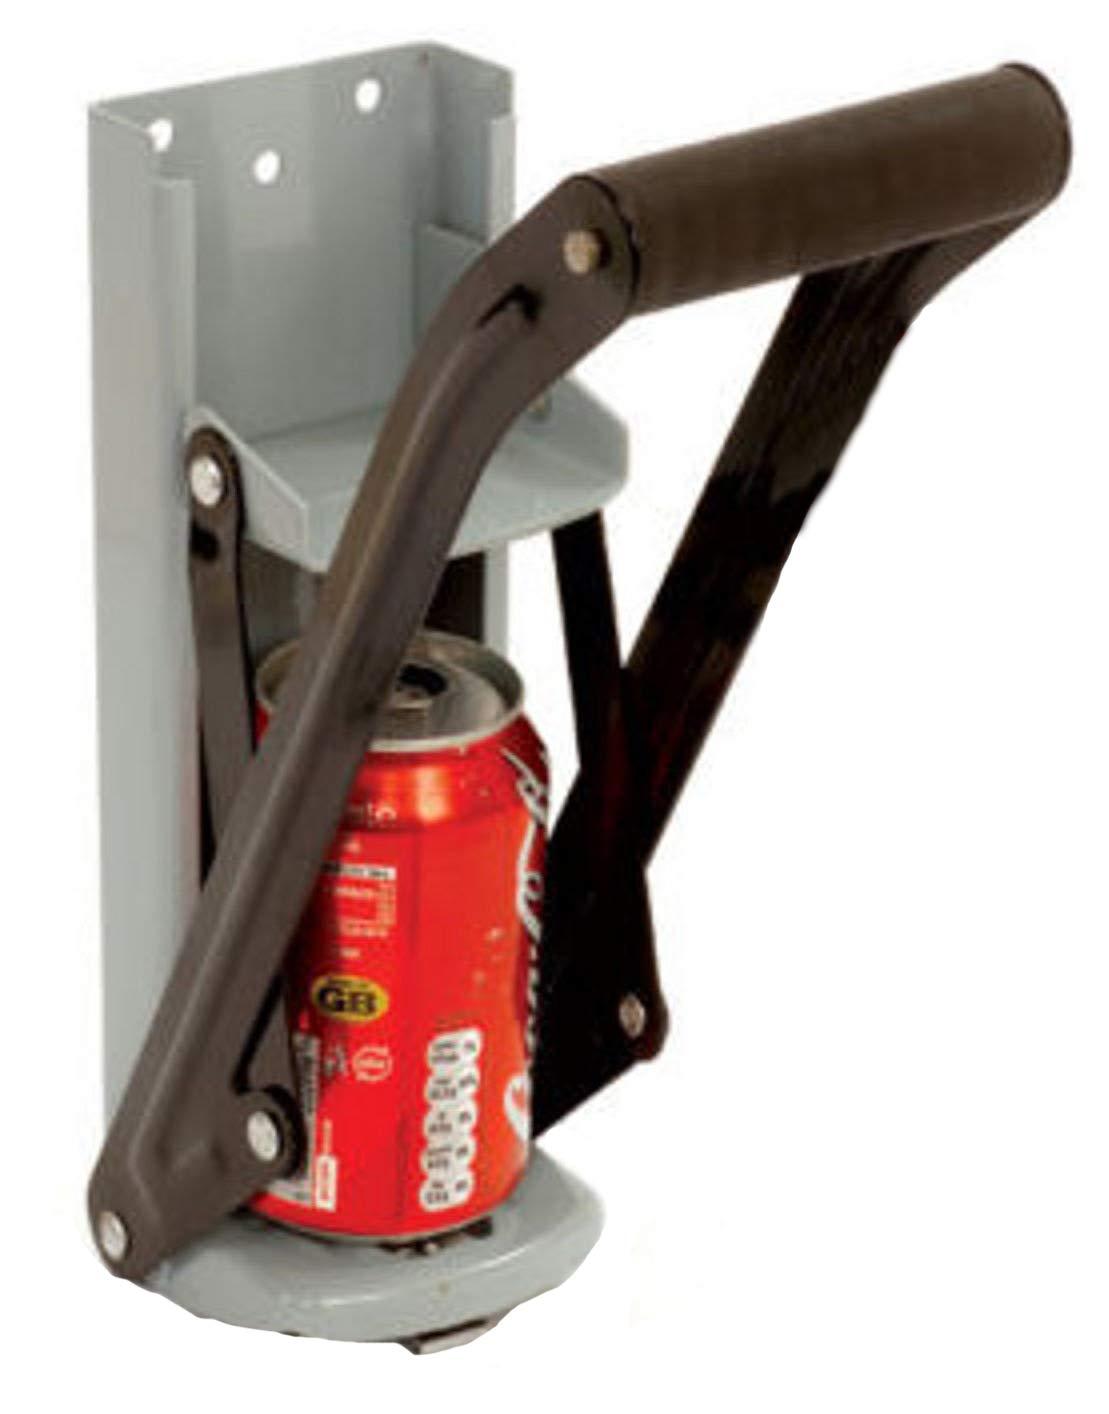 ( 2 ) 16oz Can CrusherアルミCan Crusher栓抜き壁マウント2 N1 EZ Crush B018U0WQWQ